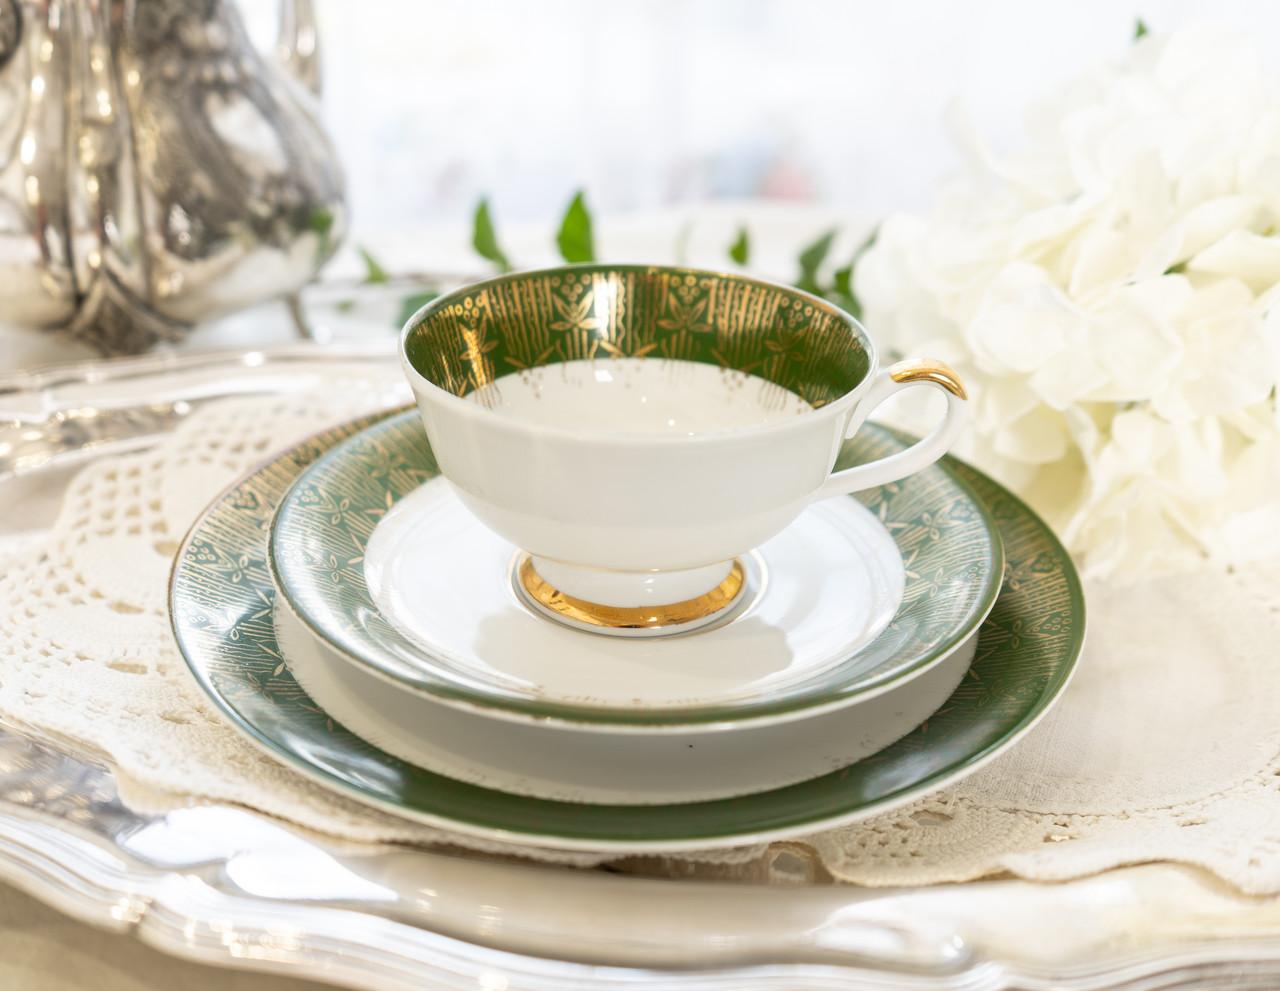 Немецкая чайная тройка, чашка, блюдце, тарелка, фарфор, Германия, K&A Krautheim,  Bavaria